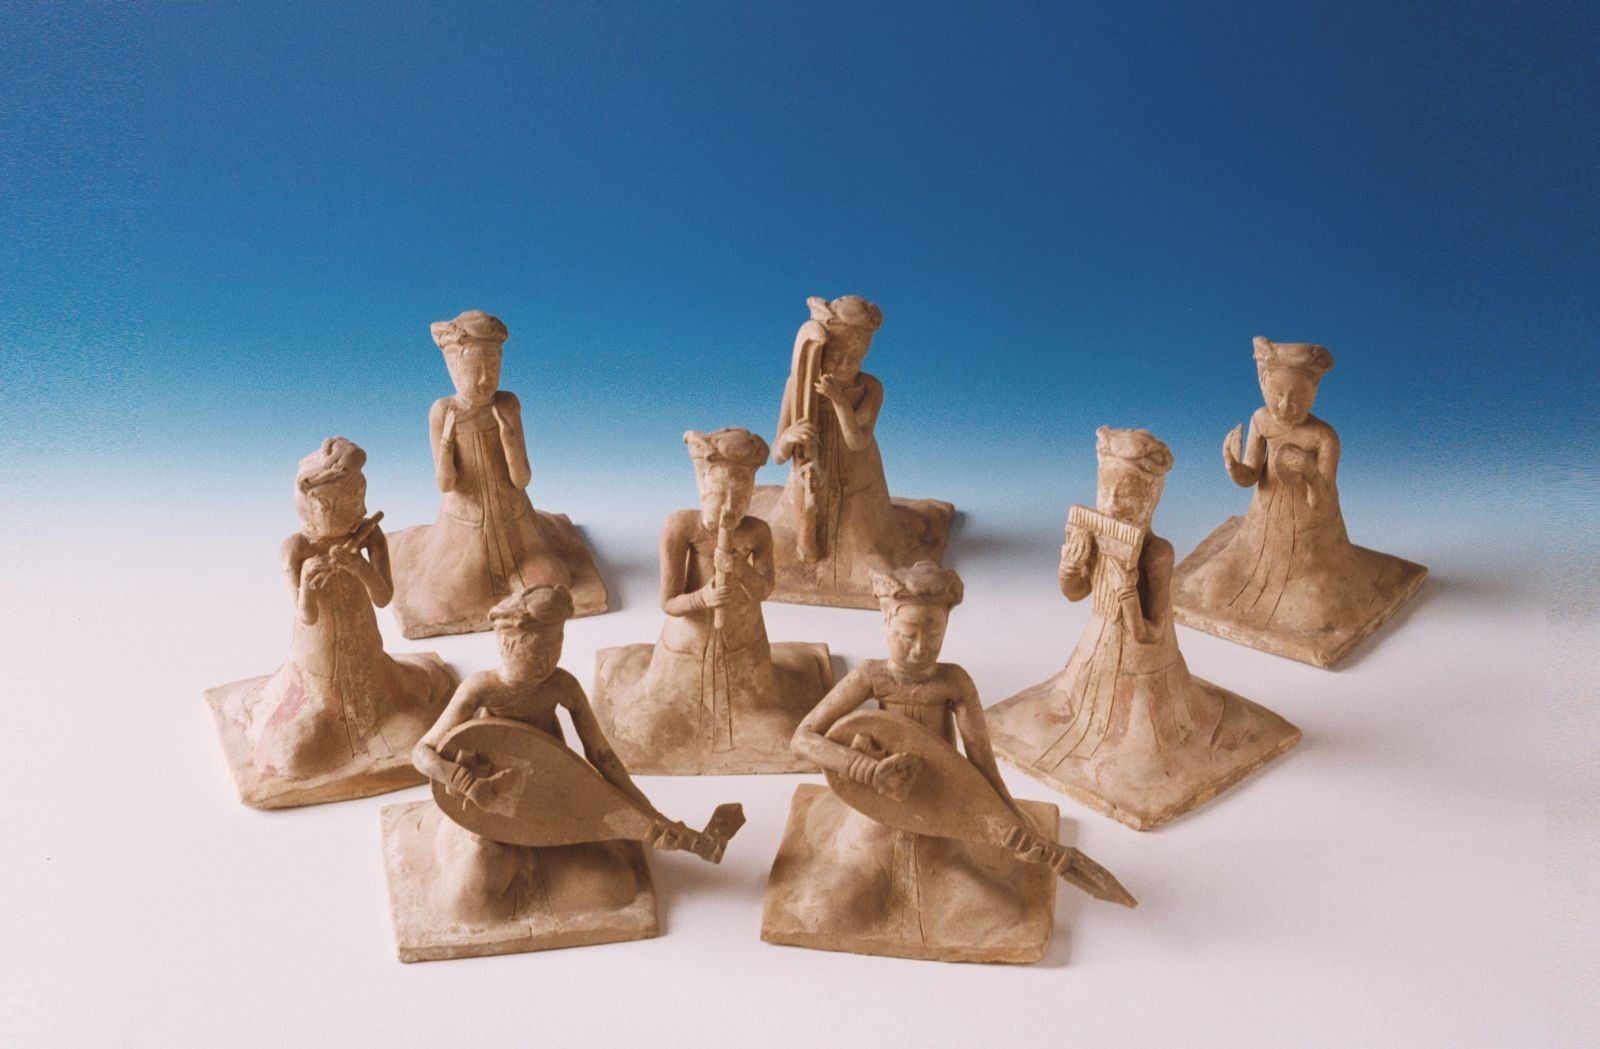 Statuette di suonatrici sedute in ceramica dipinta - Dinastia Sui (581-618 d.C.)